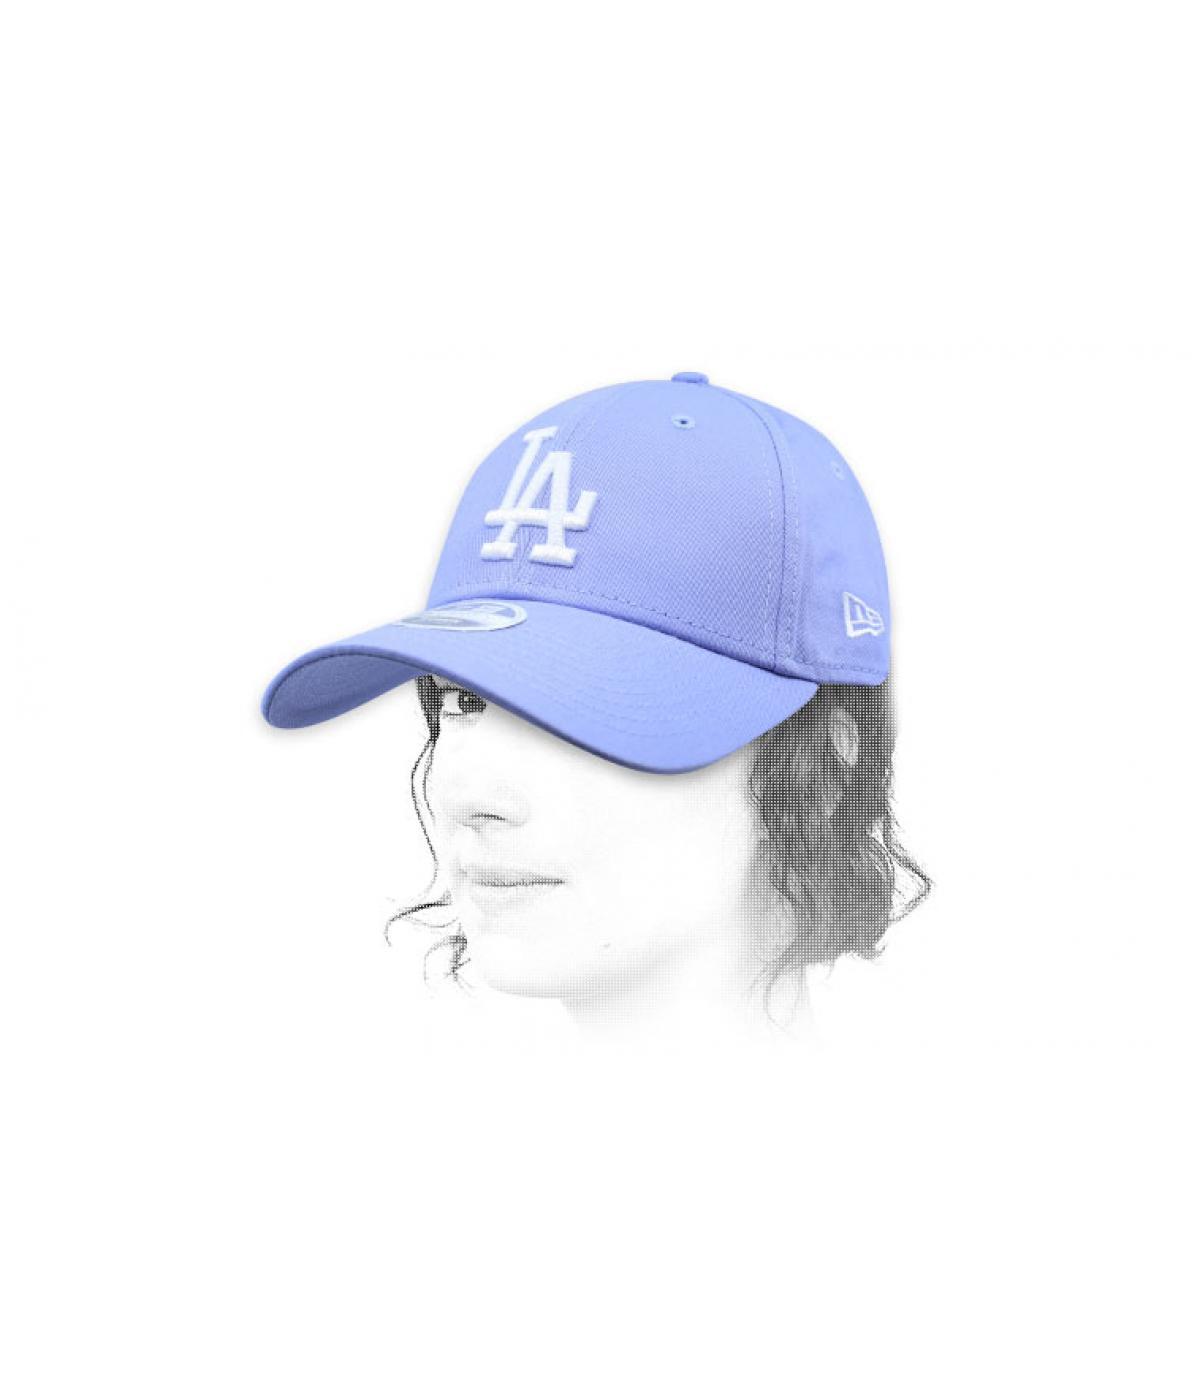 LA vrouwenpet in blauw